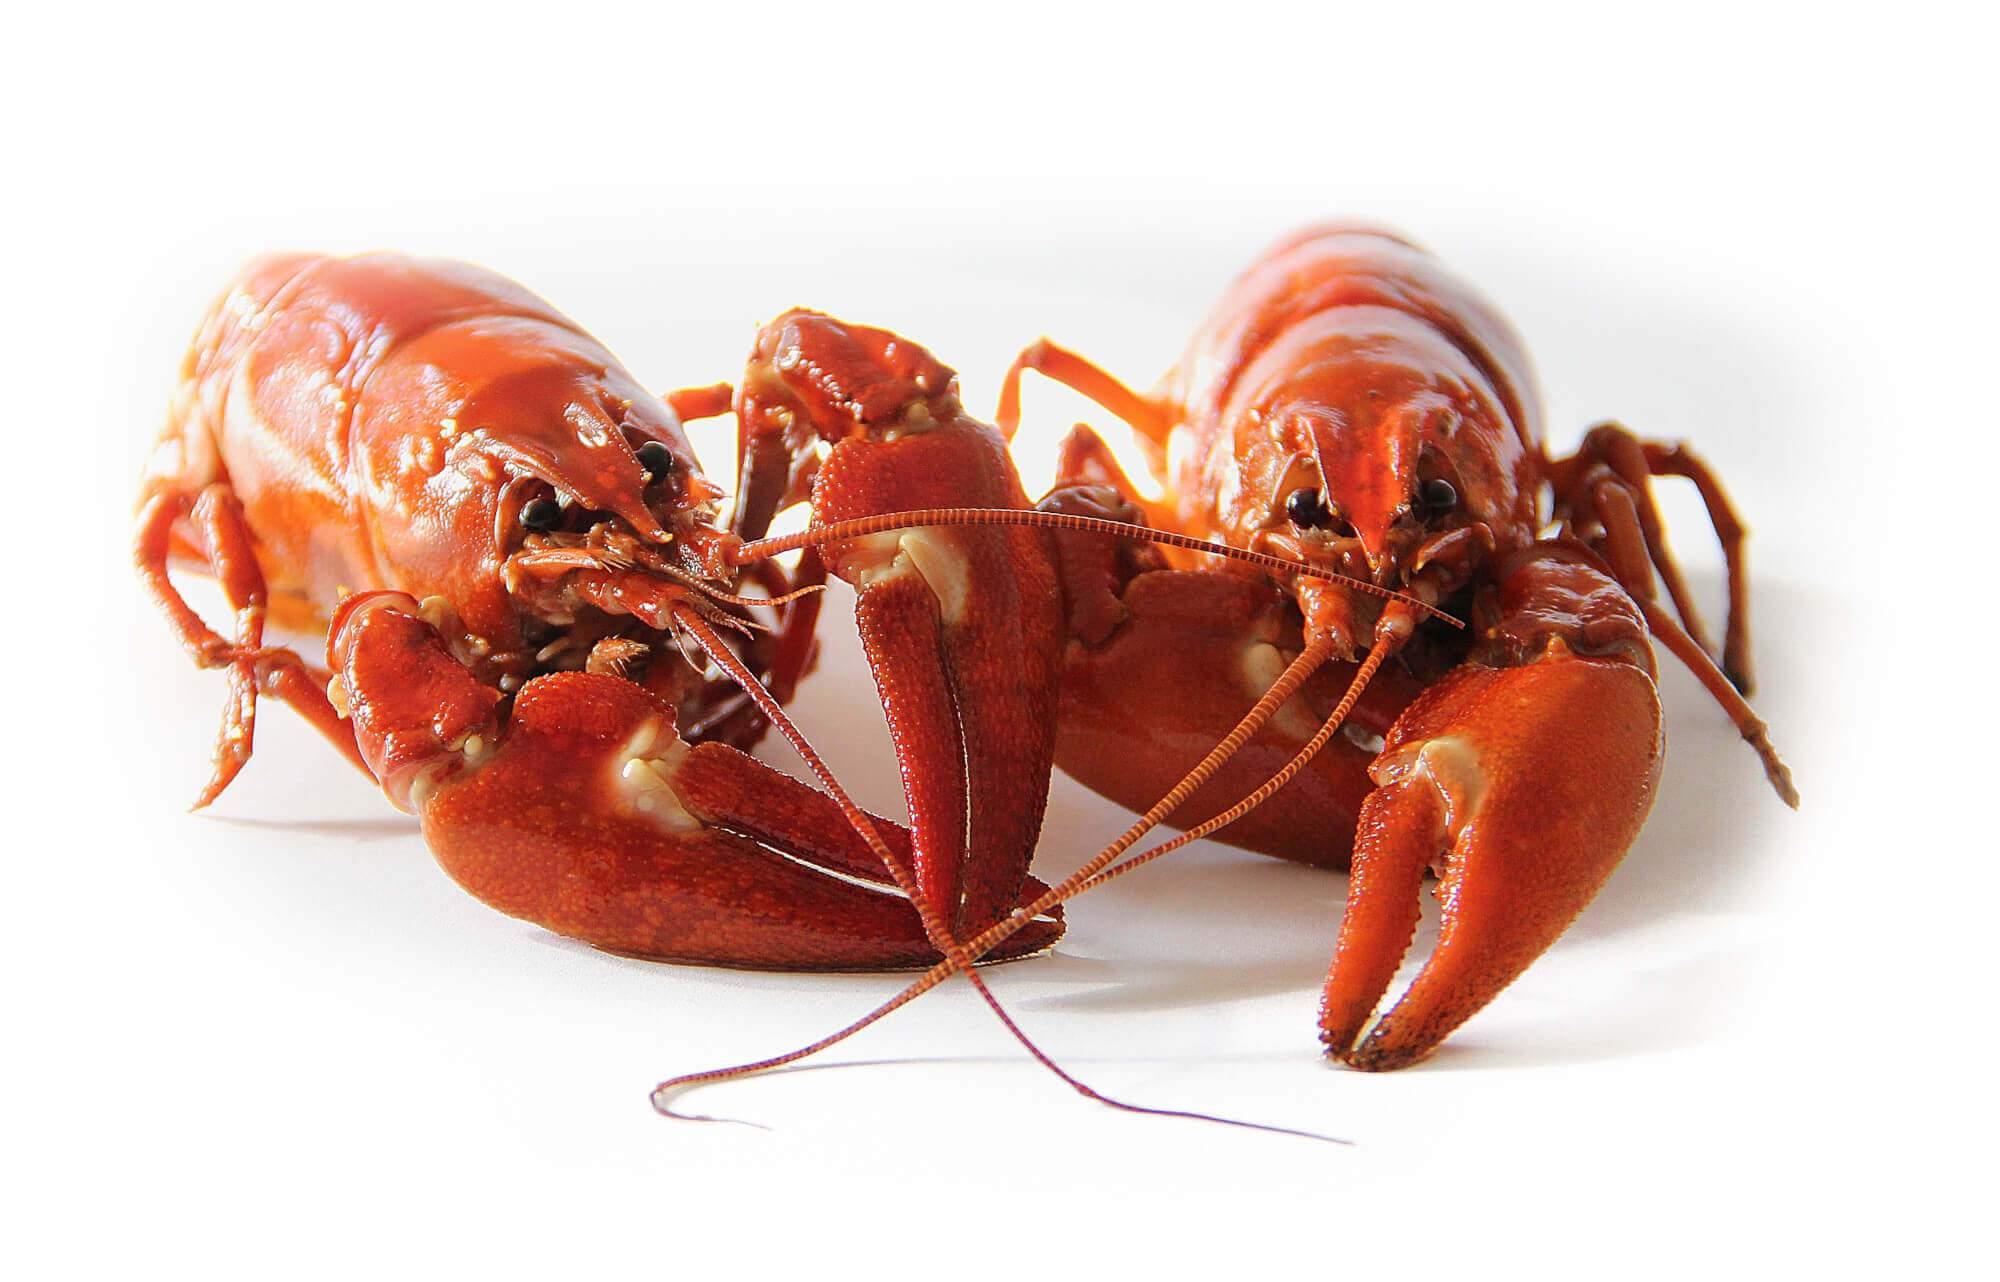 close-up-crawfish-crayfish-52959